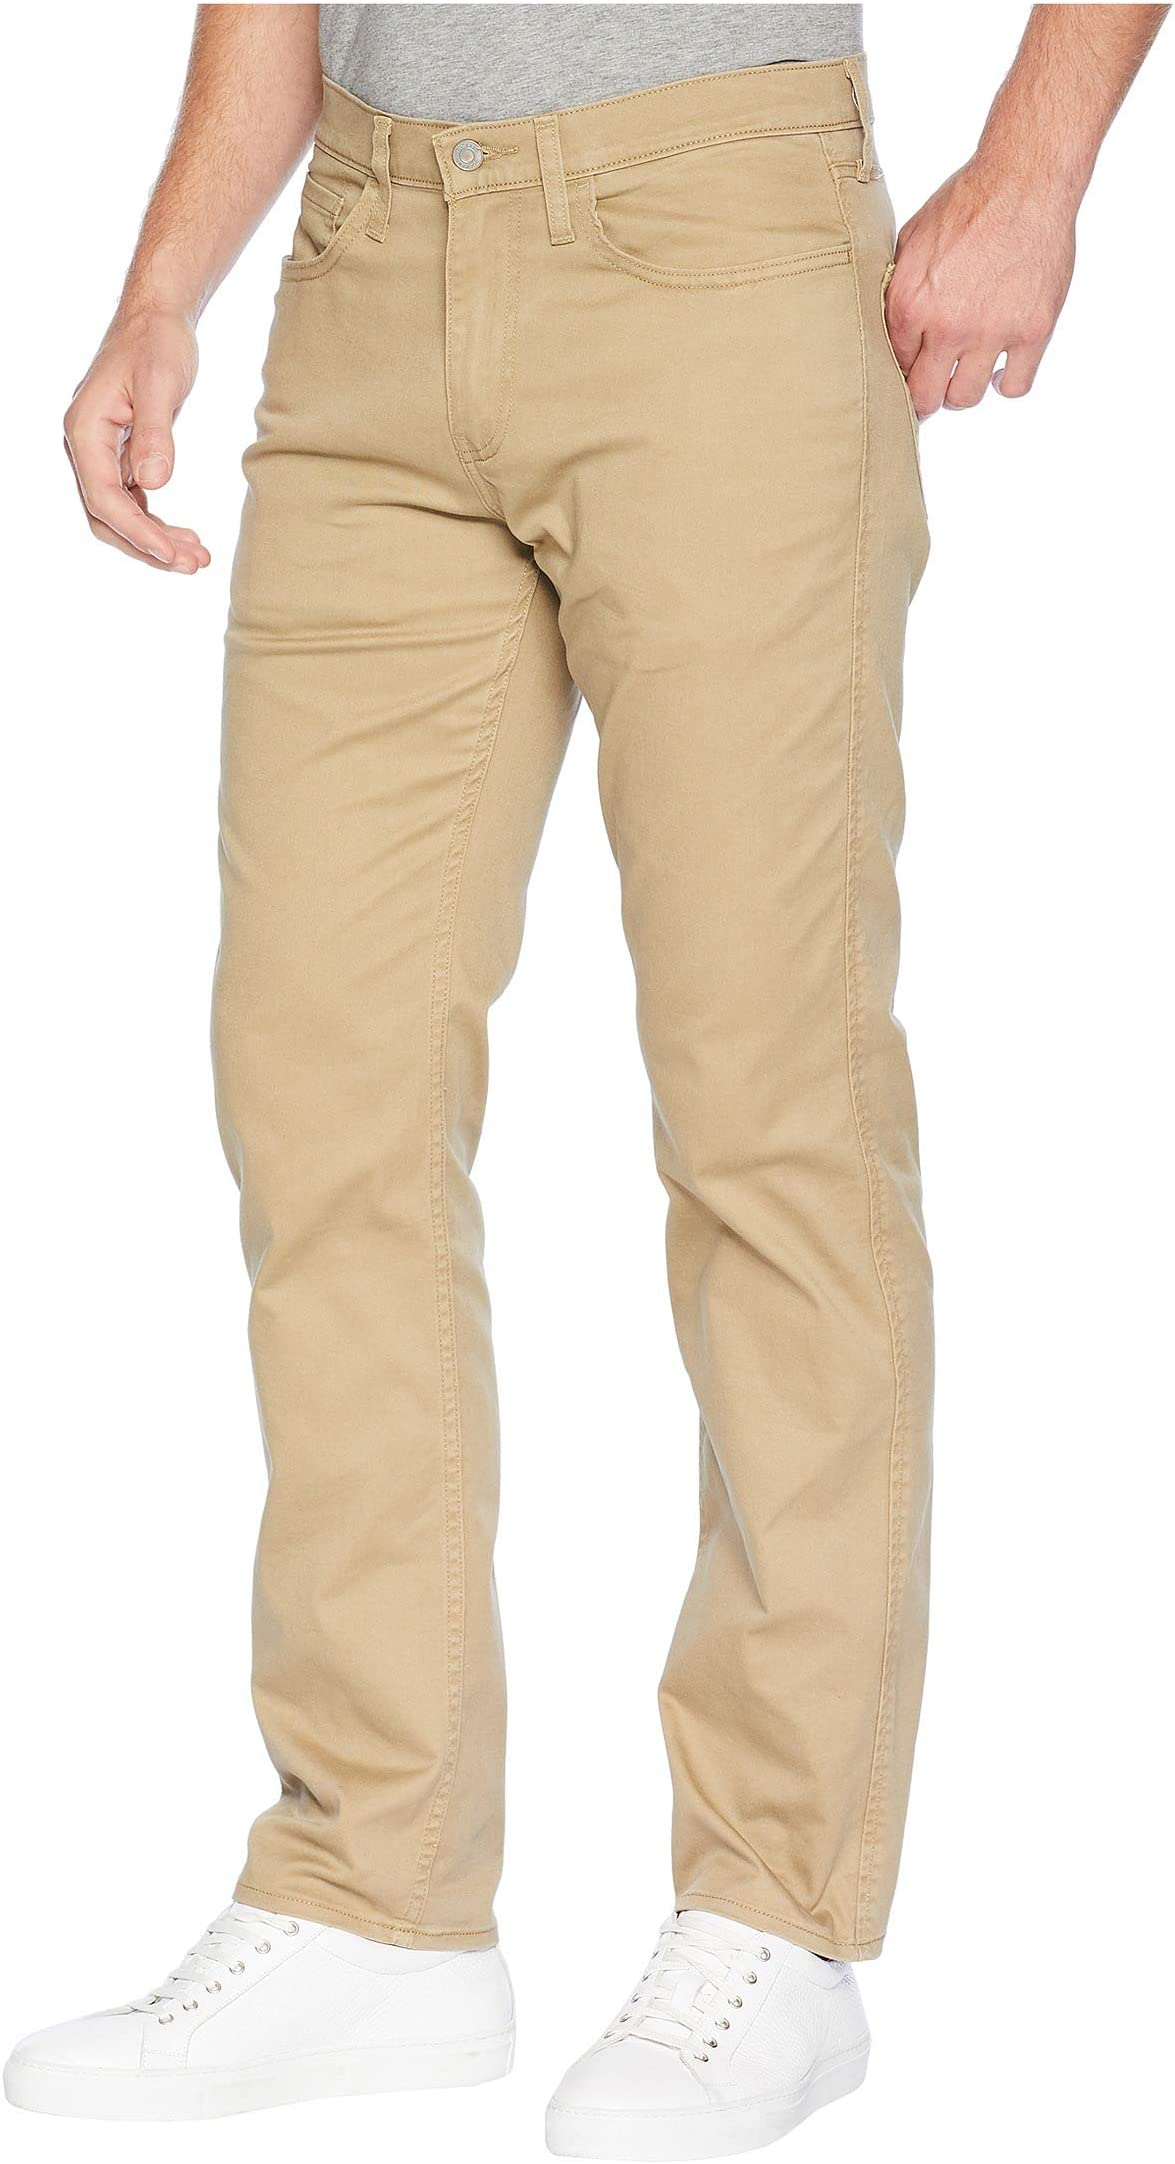 Dockers Straight Fit Jean Cut 2.0 All Seasons Tech Pants yrdRE